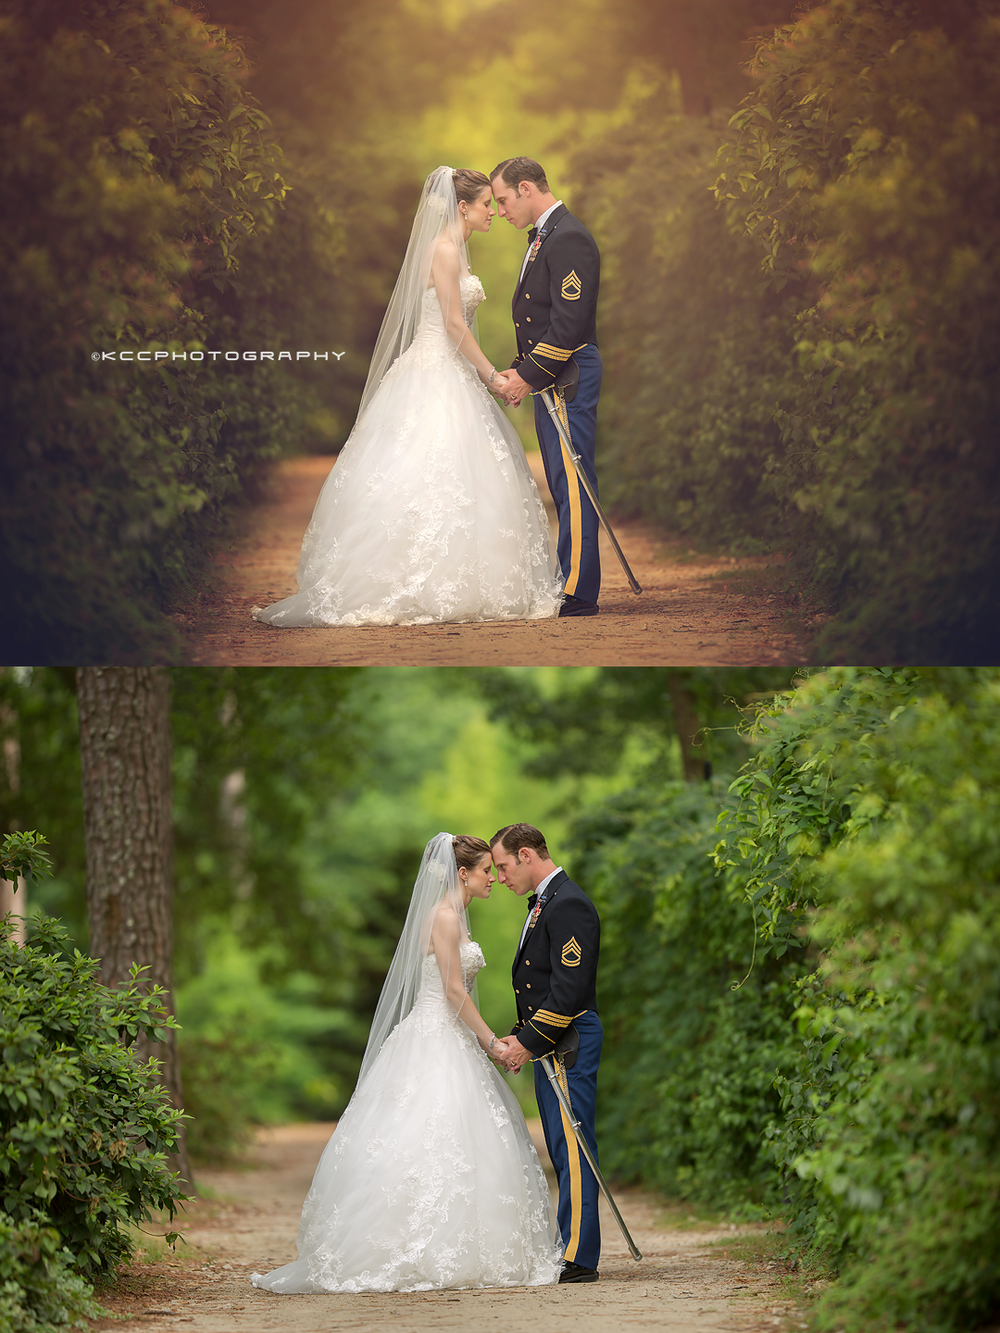 Love KCC Photography Photography editing, Lightroom